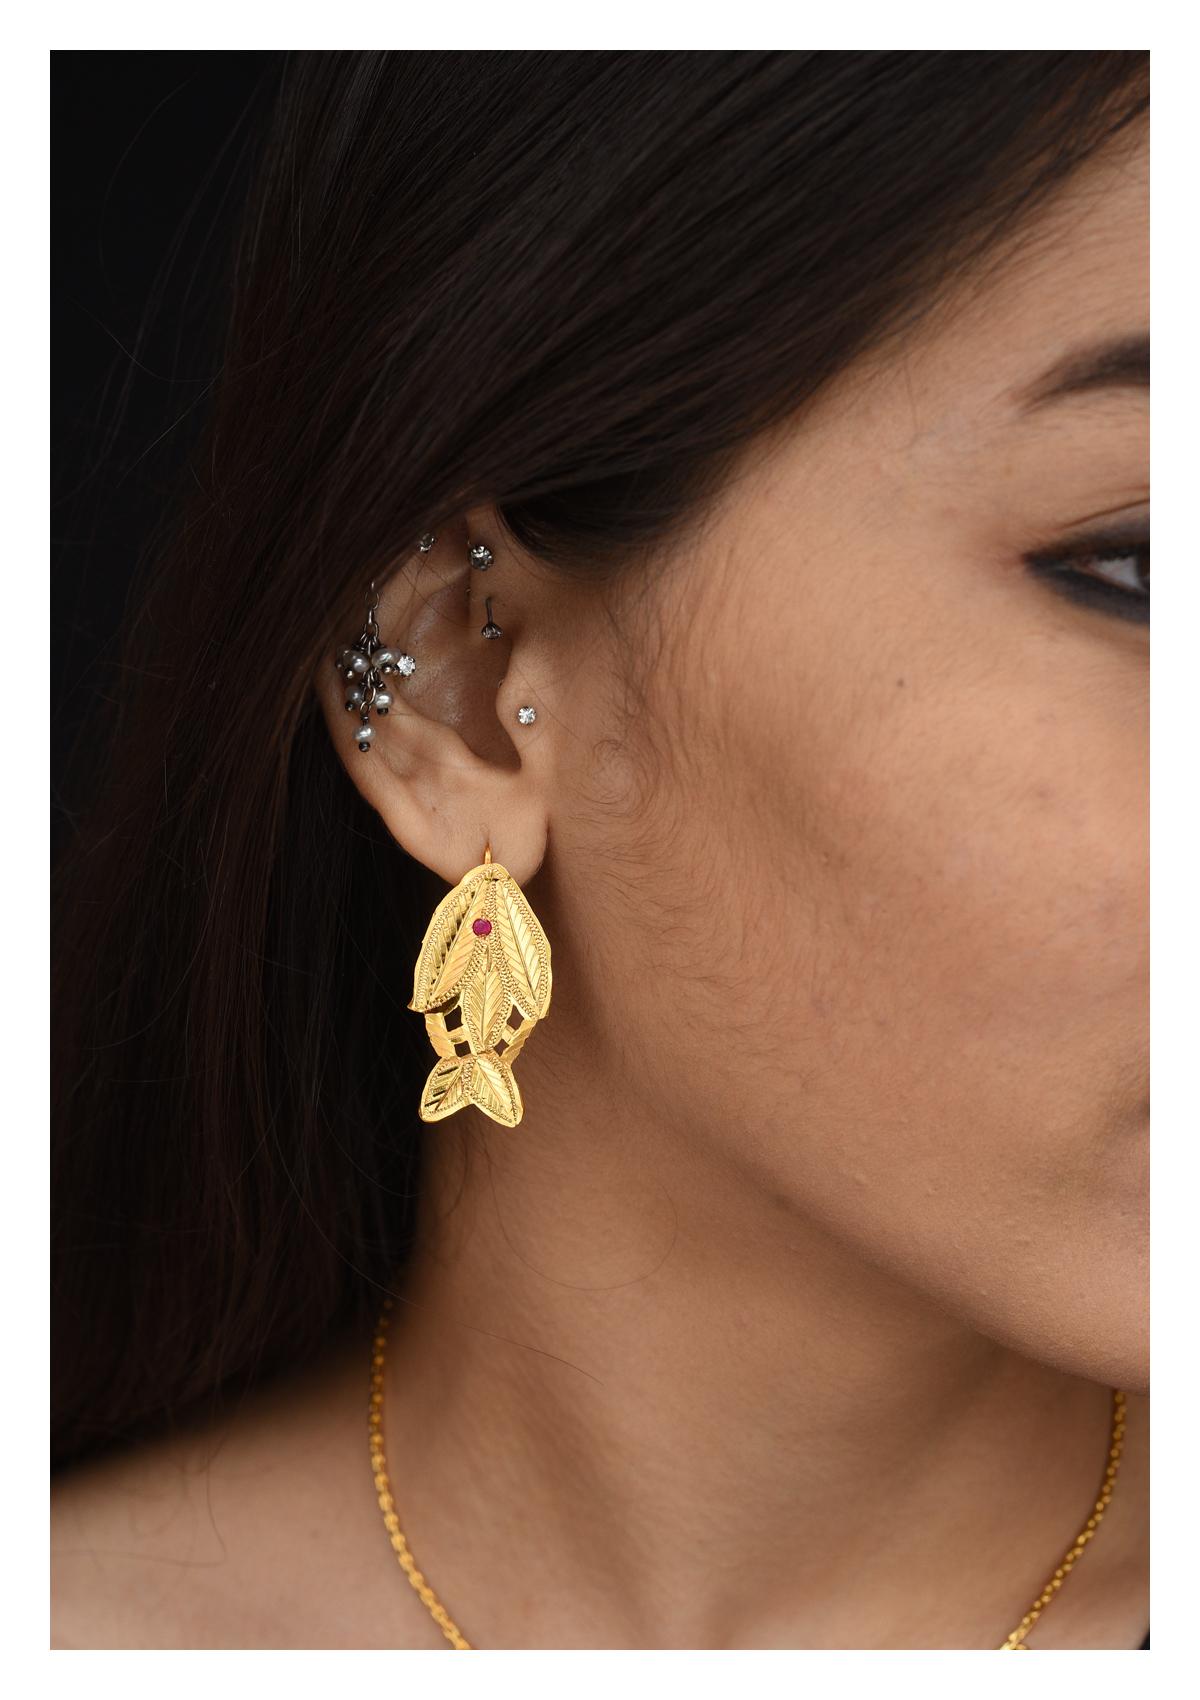 Machli Handmade Goldtone Silver Earrings